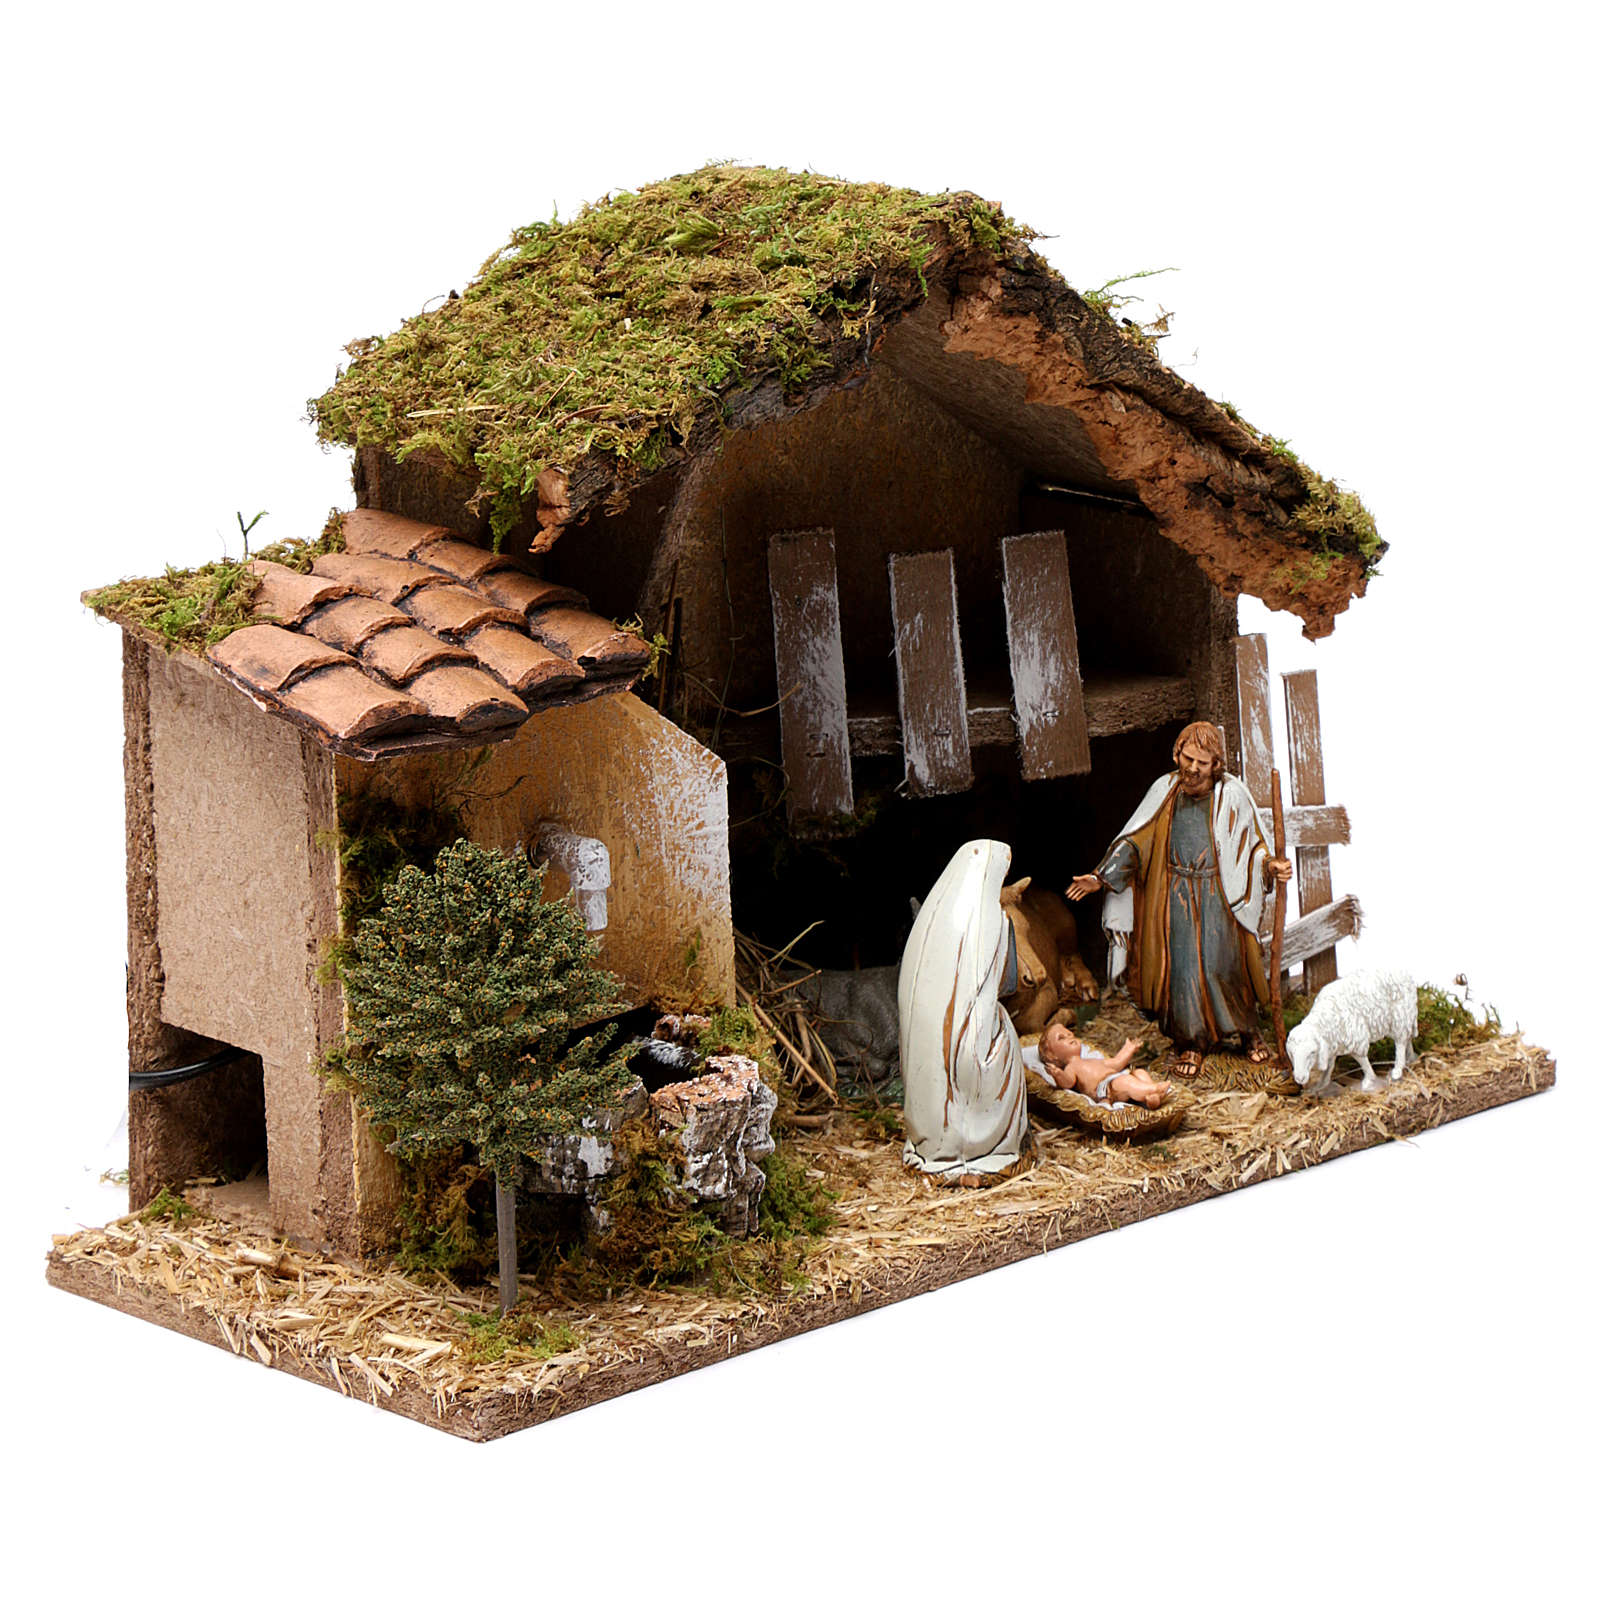 Barn with Nativity scene and fountain 20X30X20 cm 4